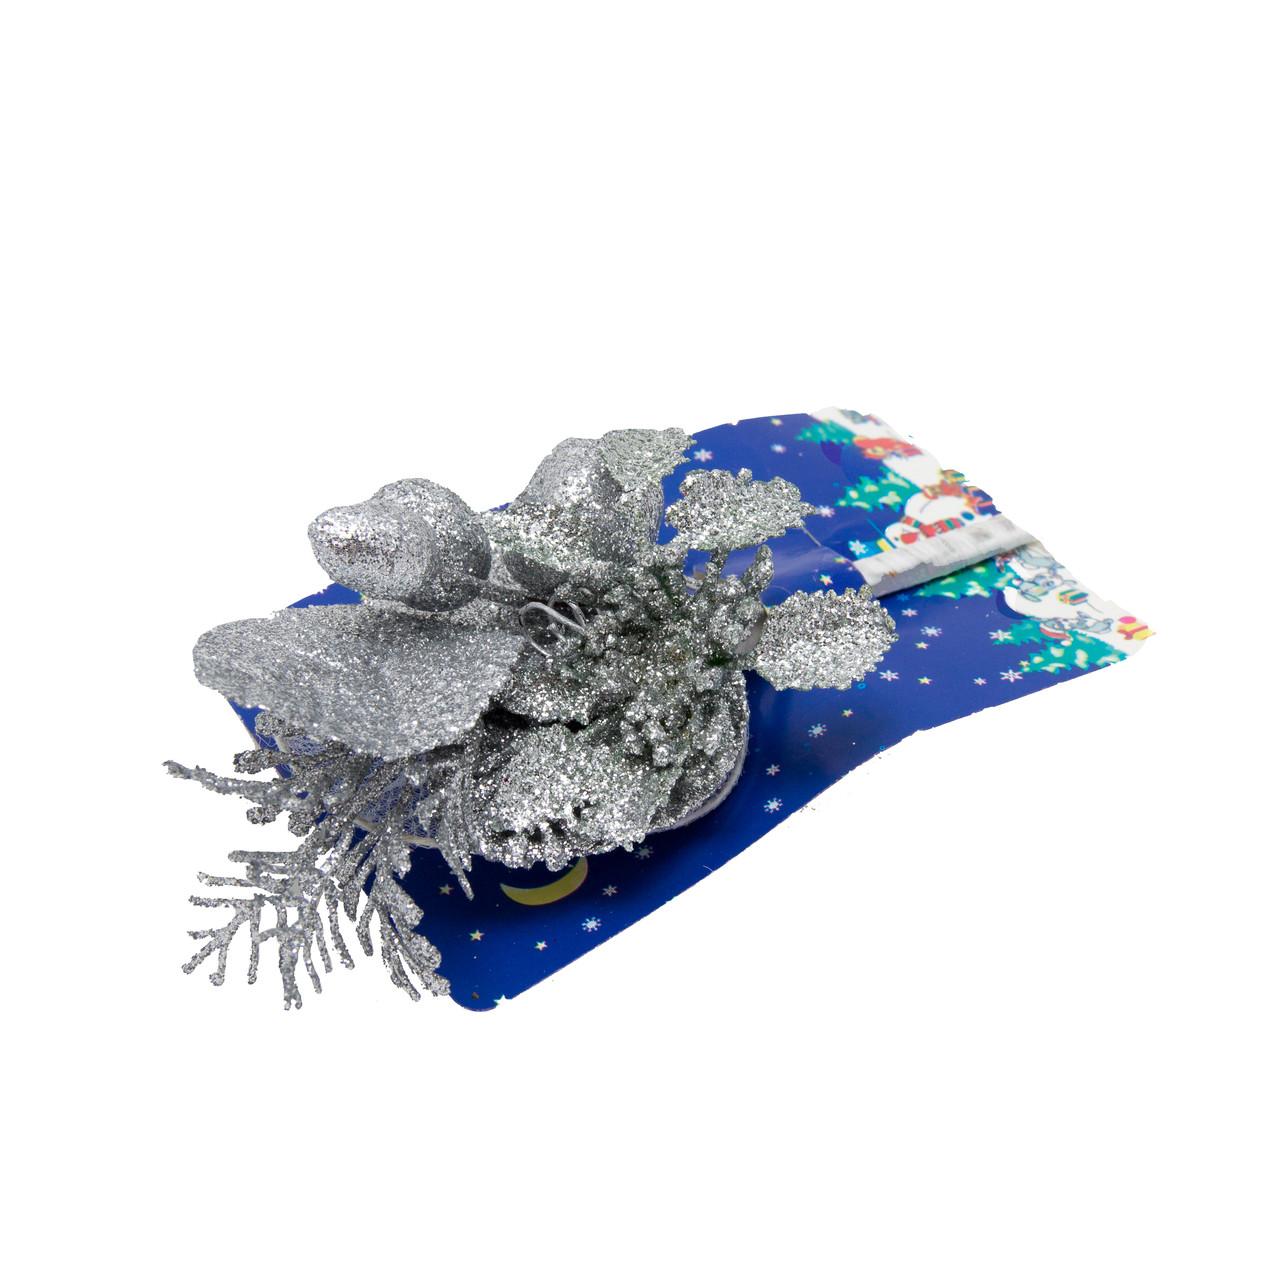 Декоративная веточка серебристая, 14 см (450053)